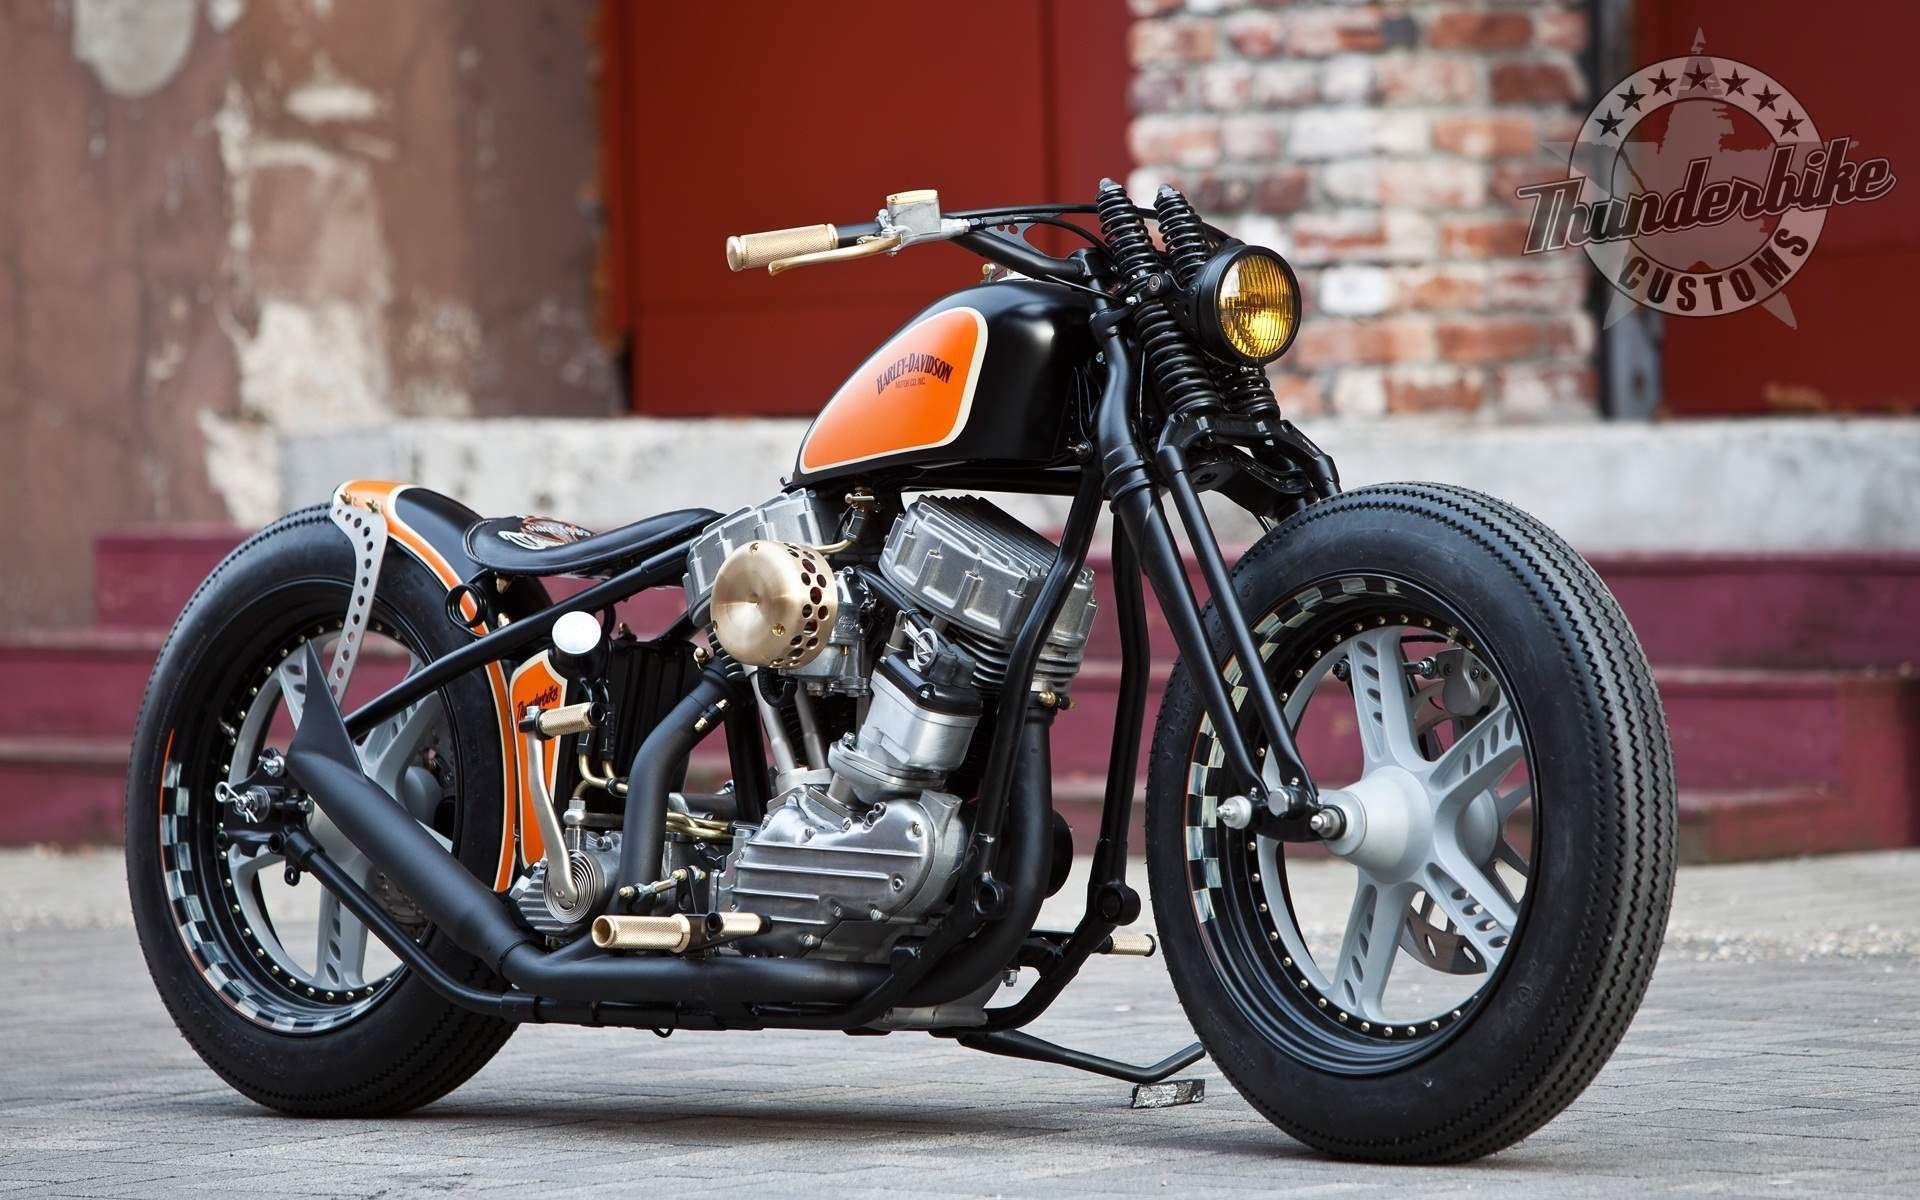 Free Custom Motorcycle Wallpaper Gallery By Wallpaper Gallery